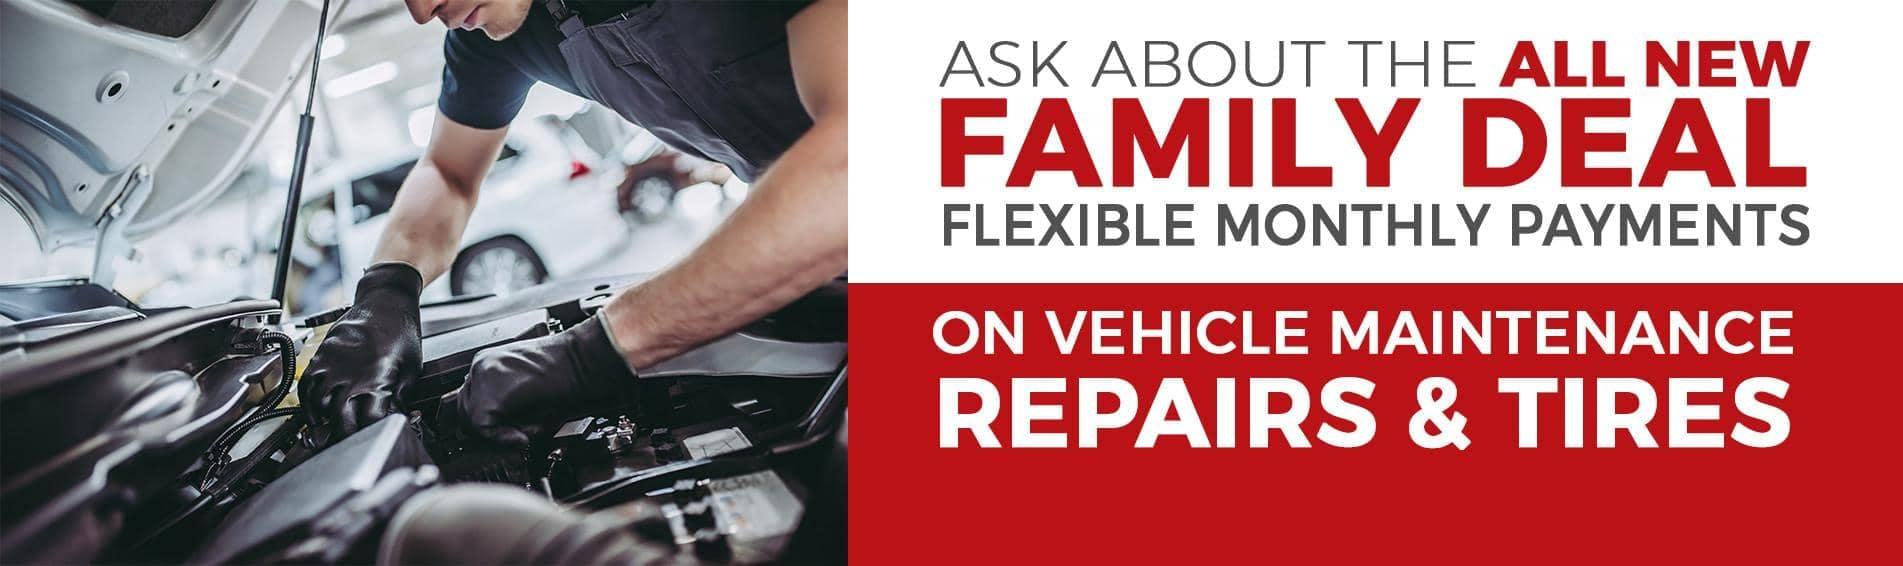 Family Deal Service Flexible Payment Plan banner